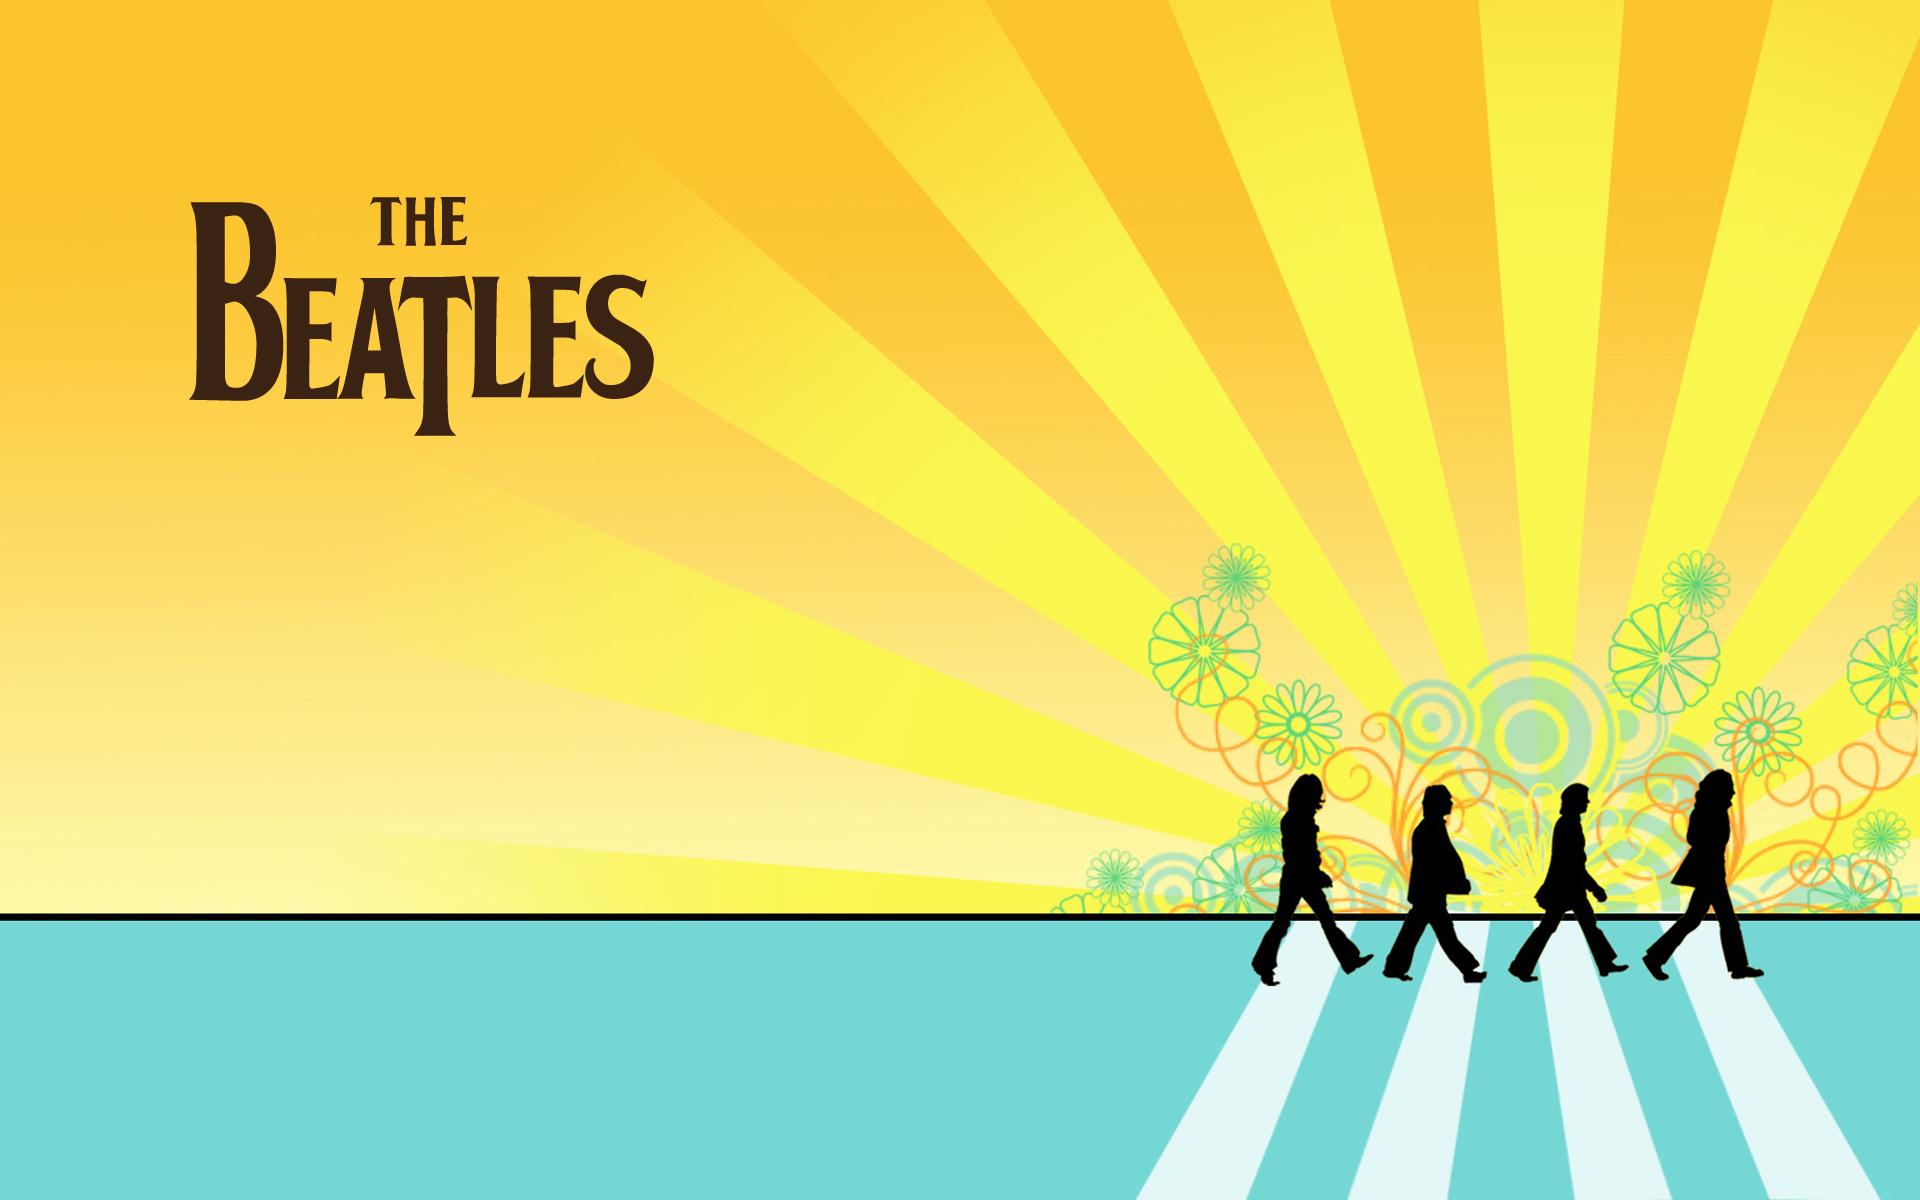 Beatles Backgrounds Download 1920x1200